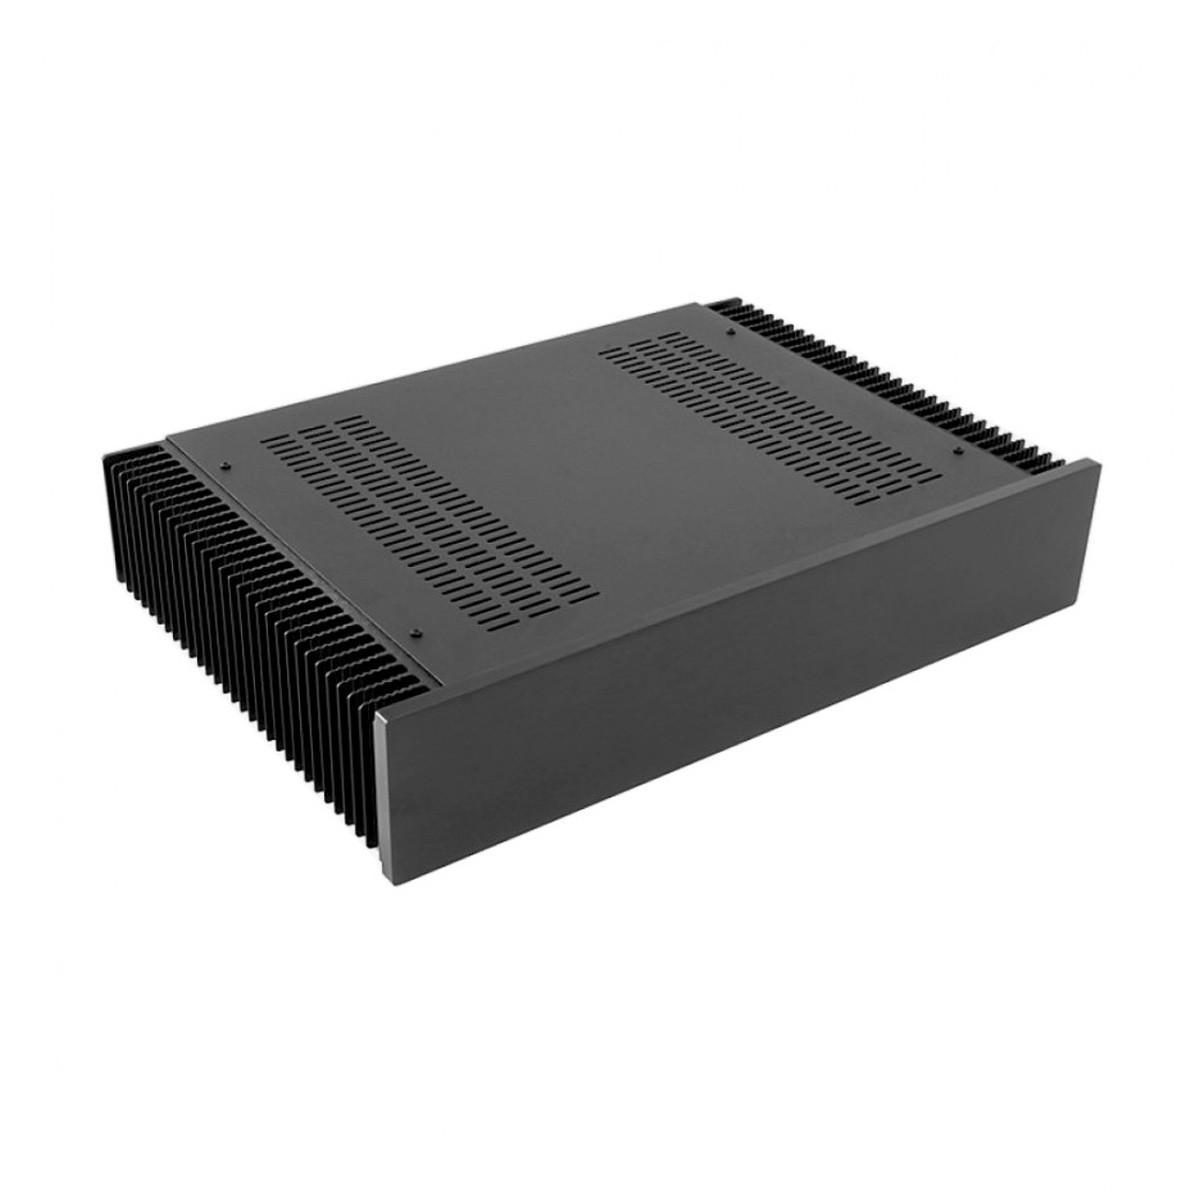 HIFI 2000 Heatsink Case 2U 300mm - Front 10mm Black